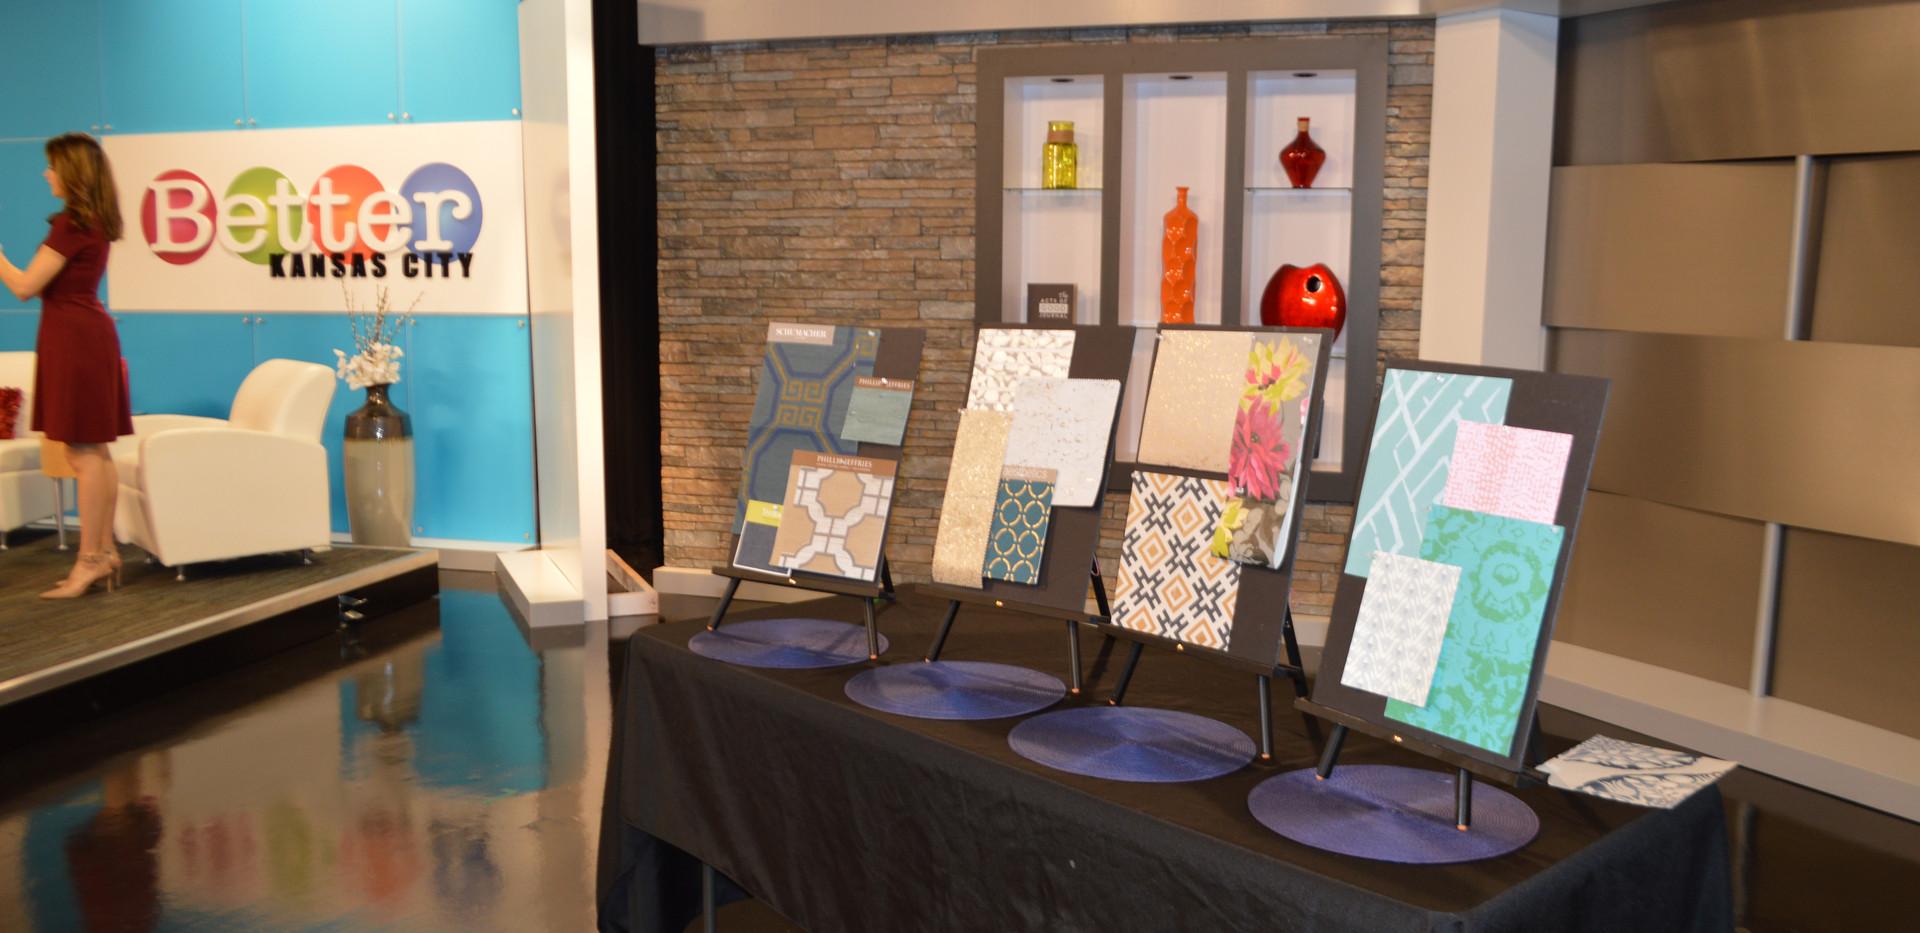 Angela Smeed Design teaching about Wallpaper trends on KCTV5 Better Kansas City.